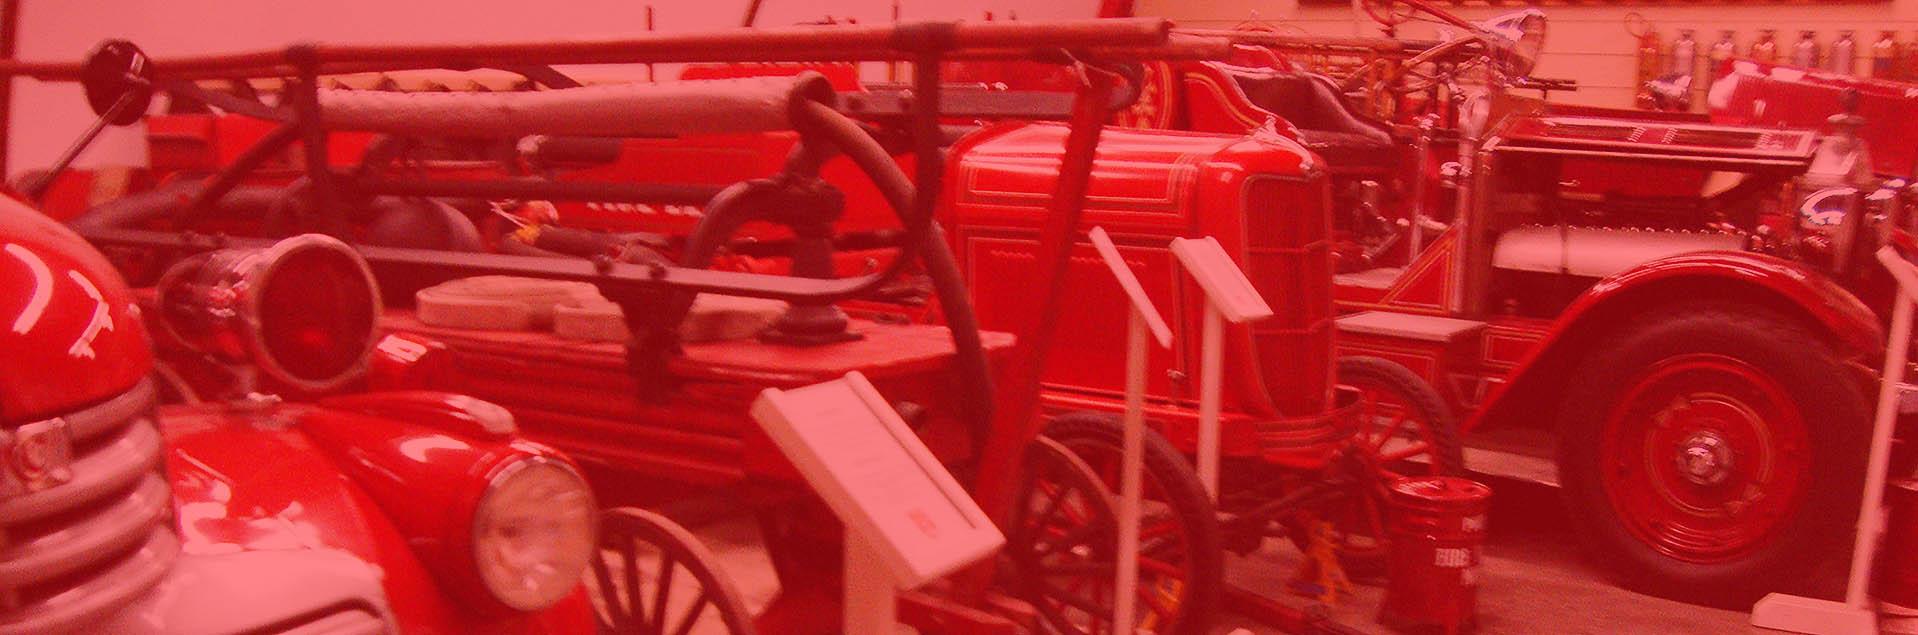 Canadian Fire Fighters Museum Fire Trucks